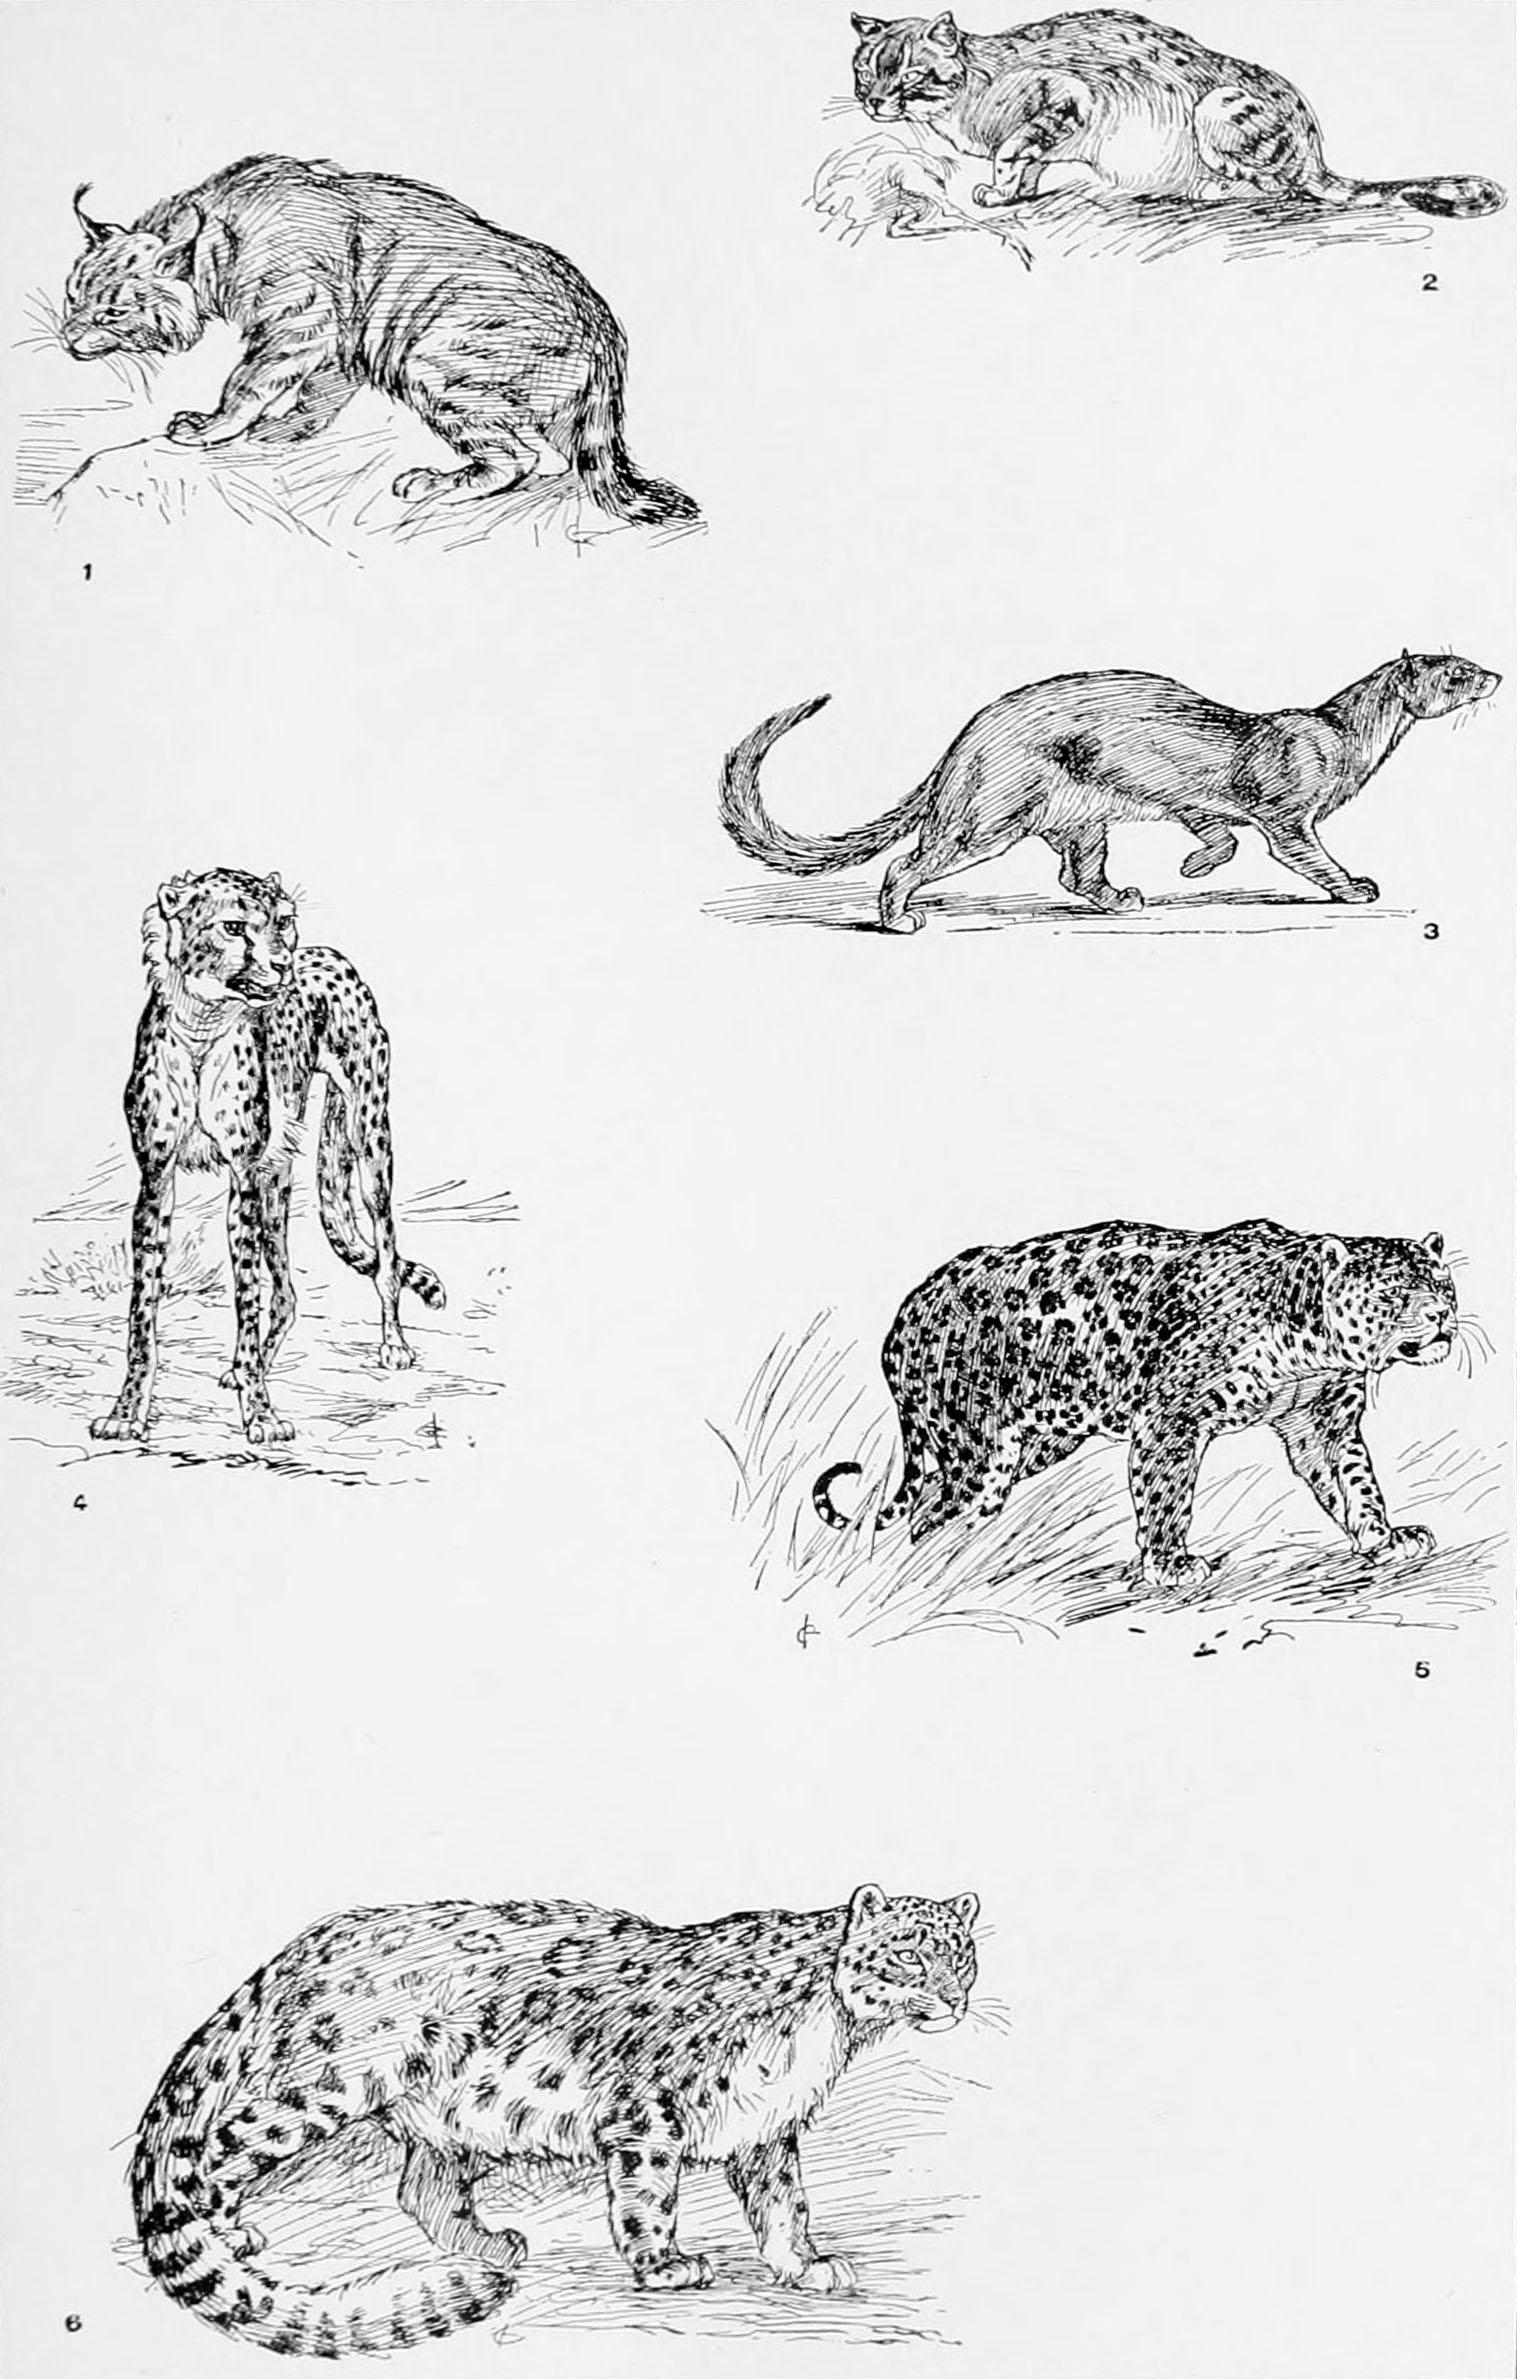 File:NIE 1905 Cat - wild cats.jpg - Wikimedia Commons